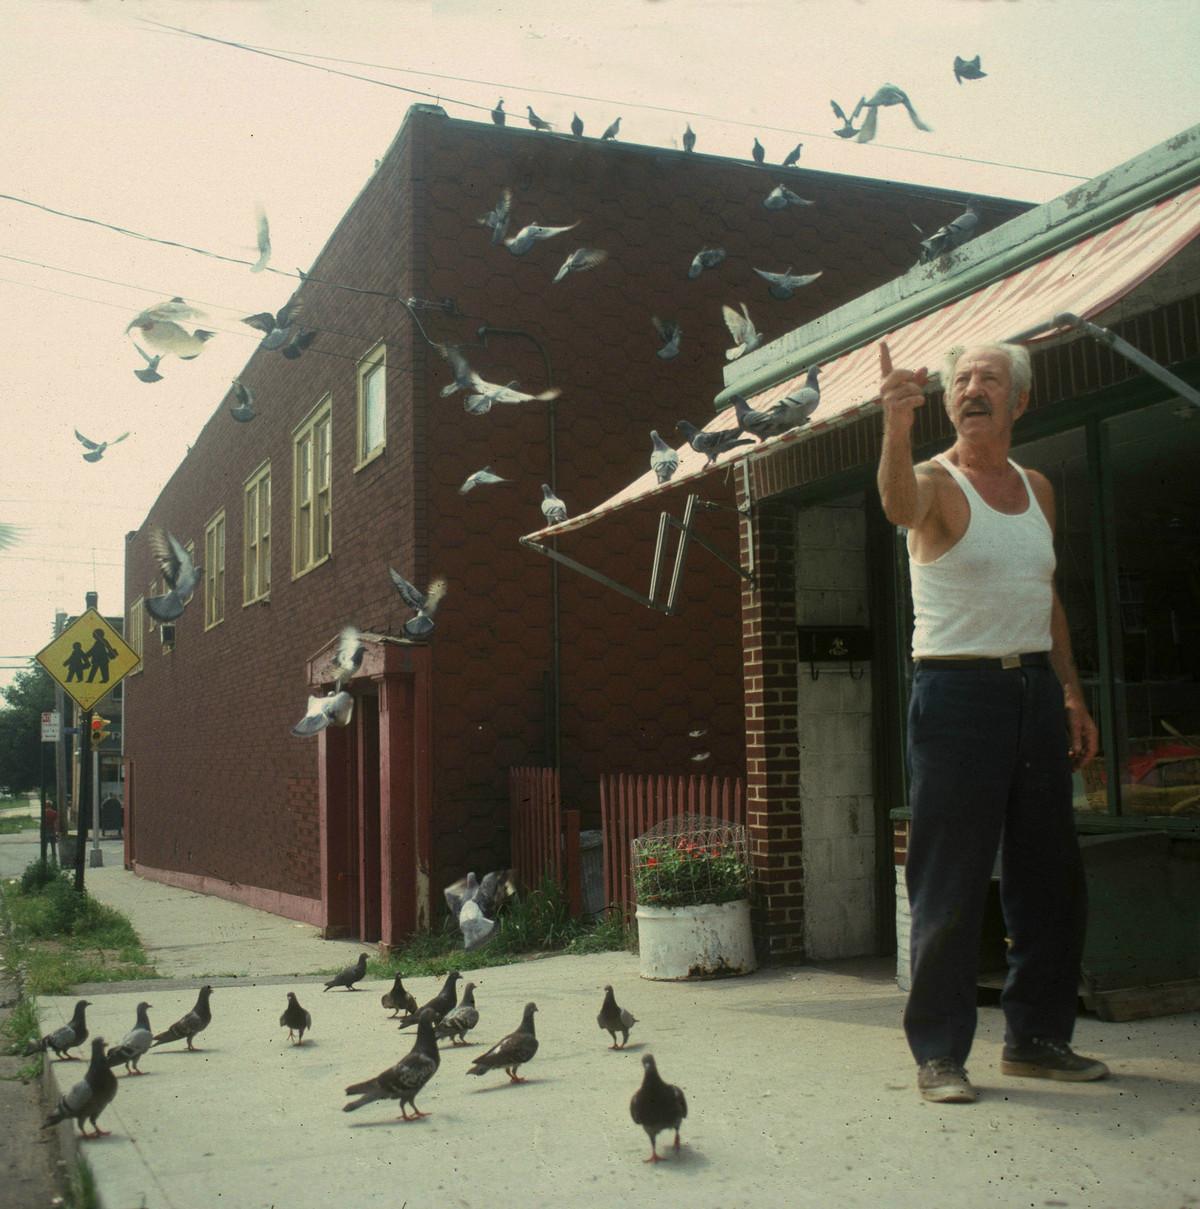 fotograf_steven_siegel_nju_york_1980-3